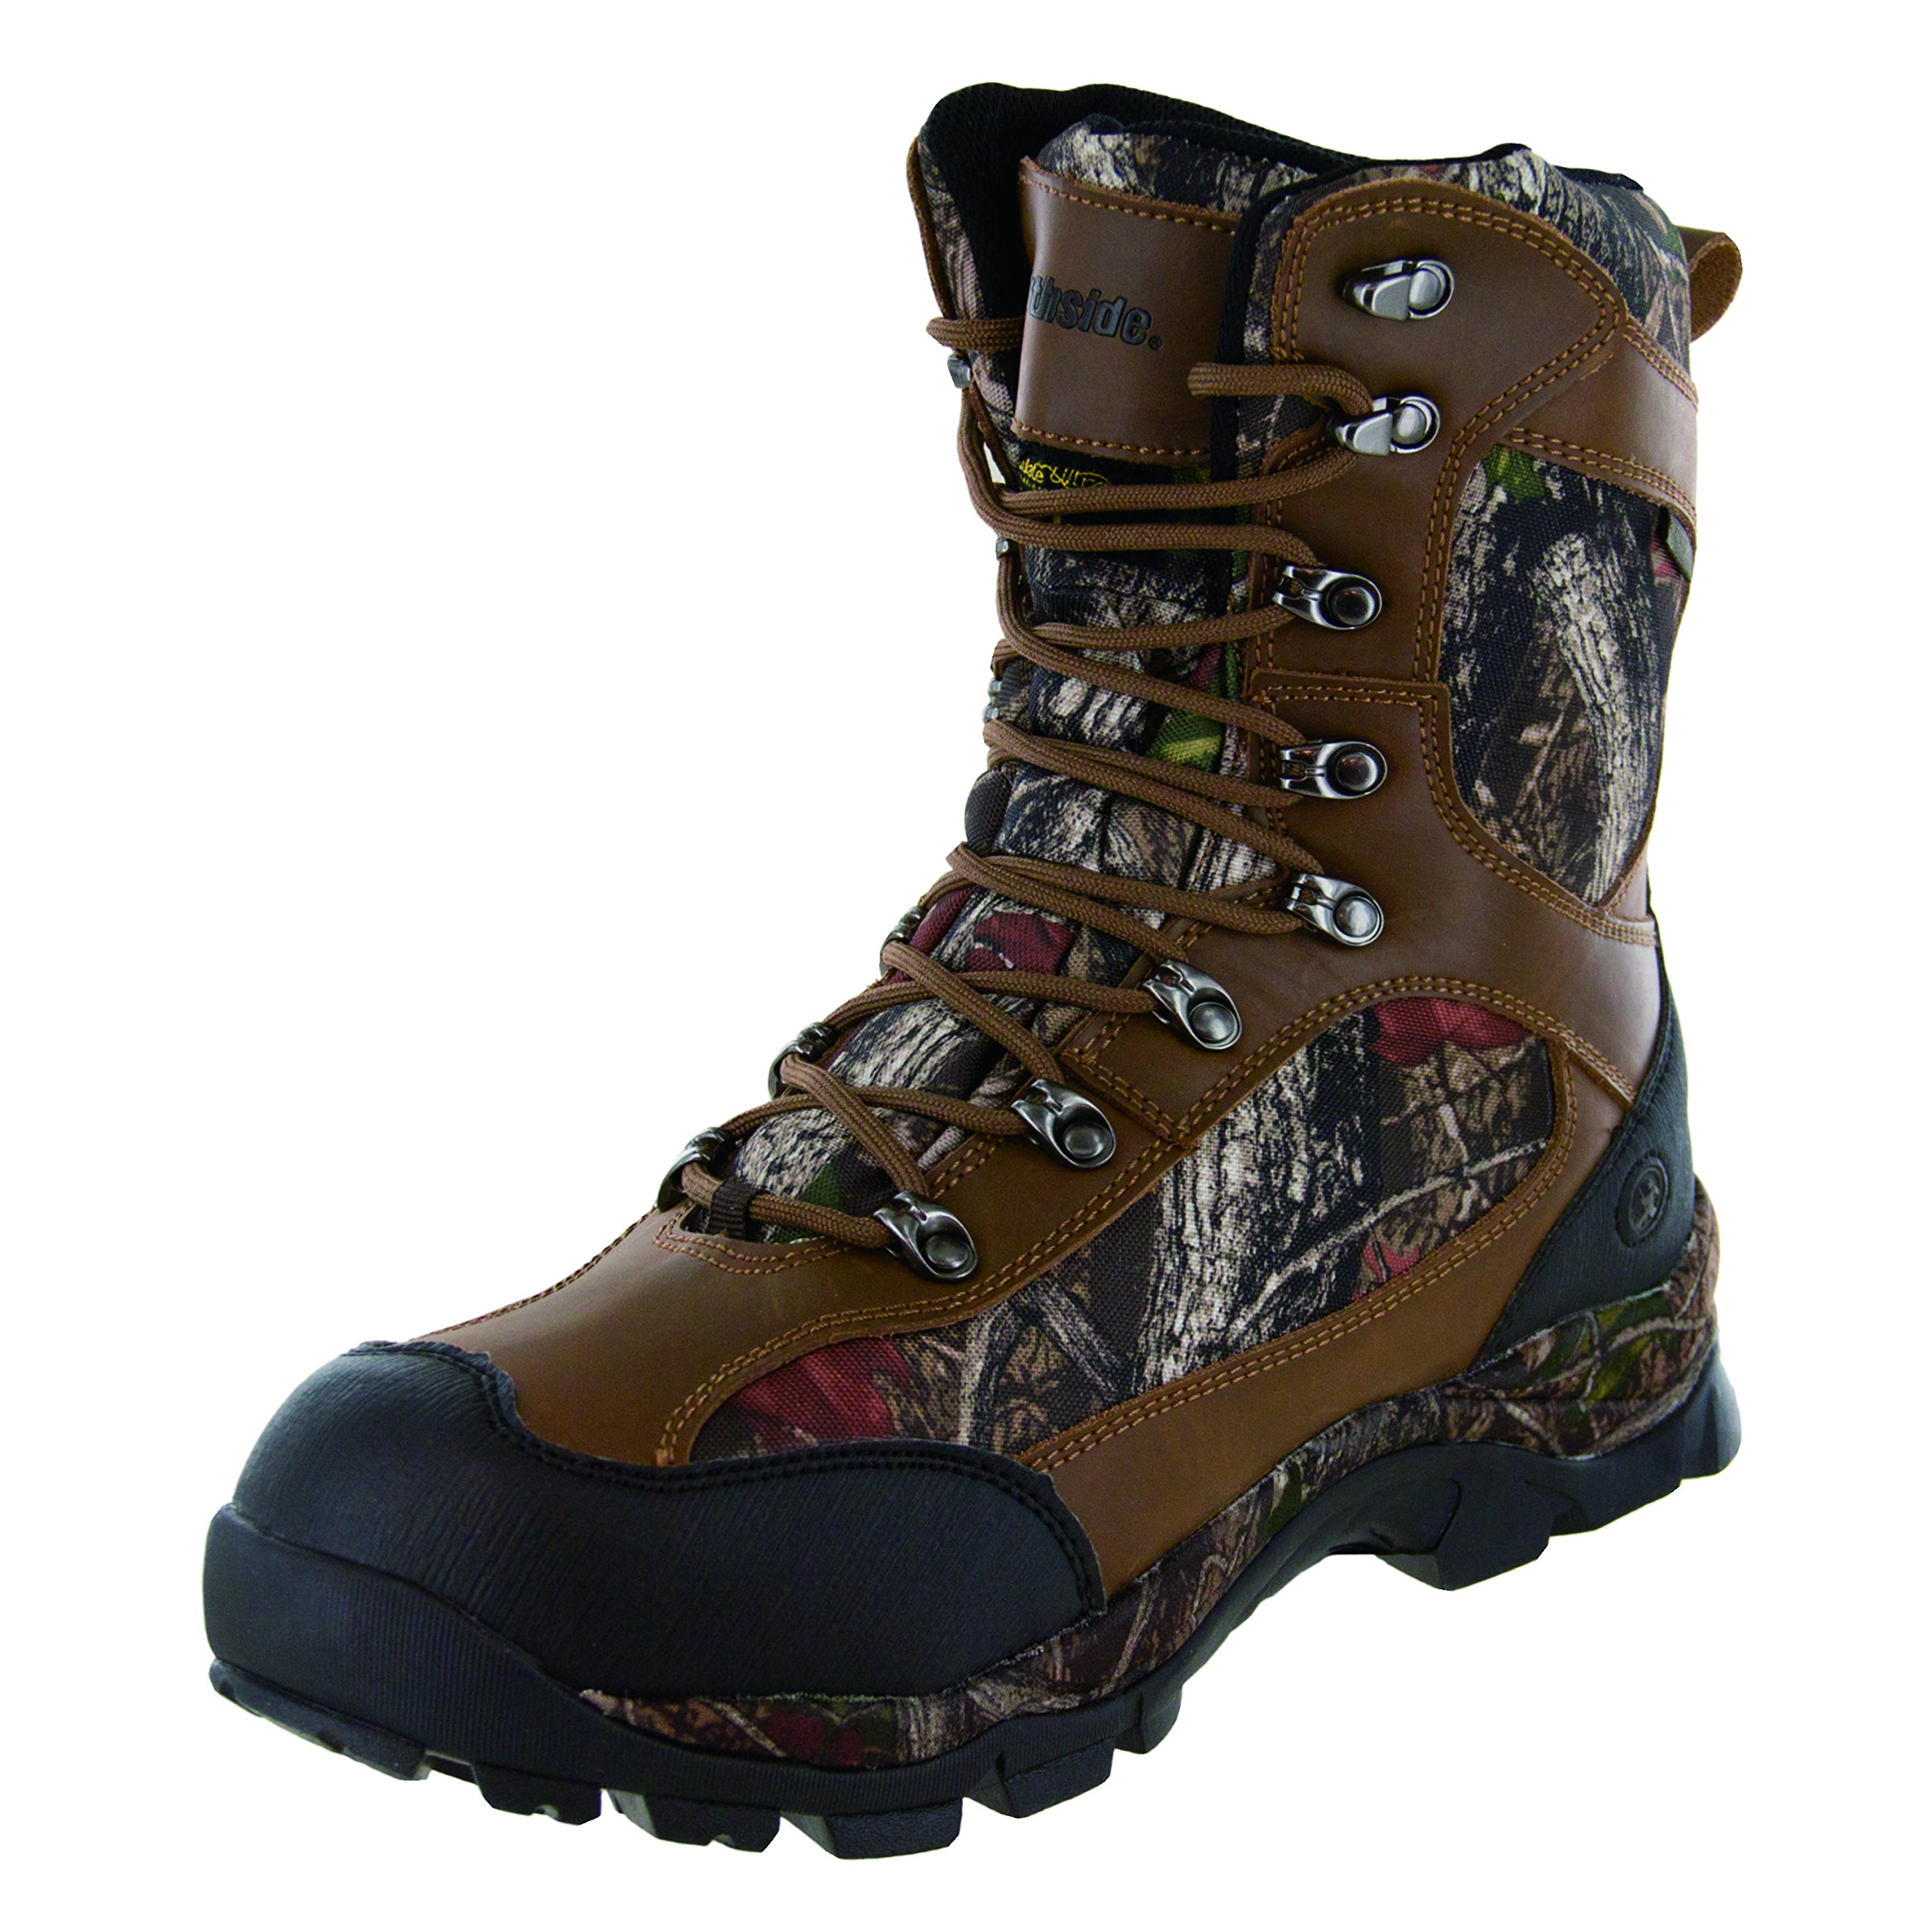 Northside Men's Prowler 400 Hunting Boot, Tan Camo, 13 M US